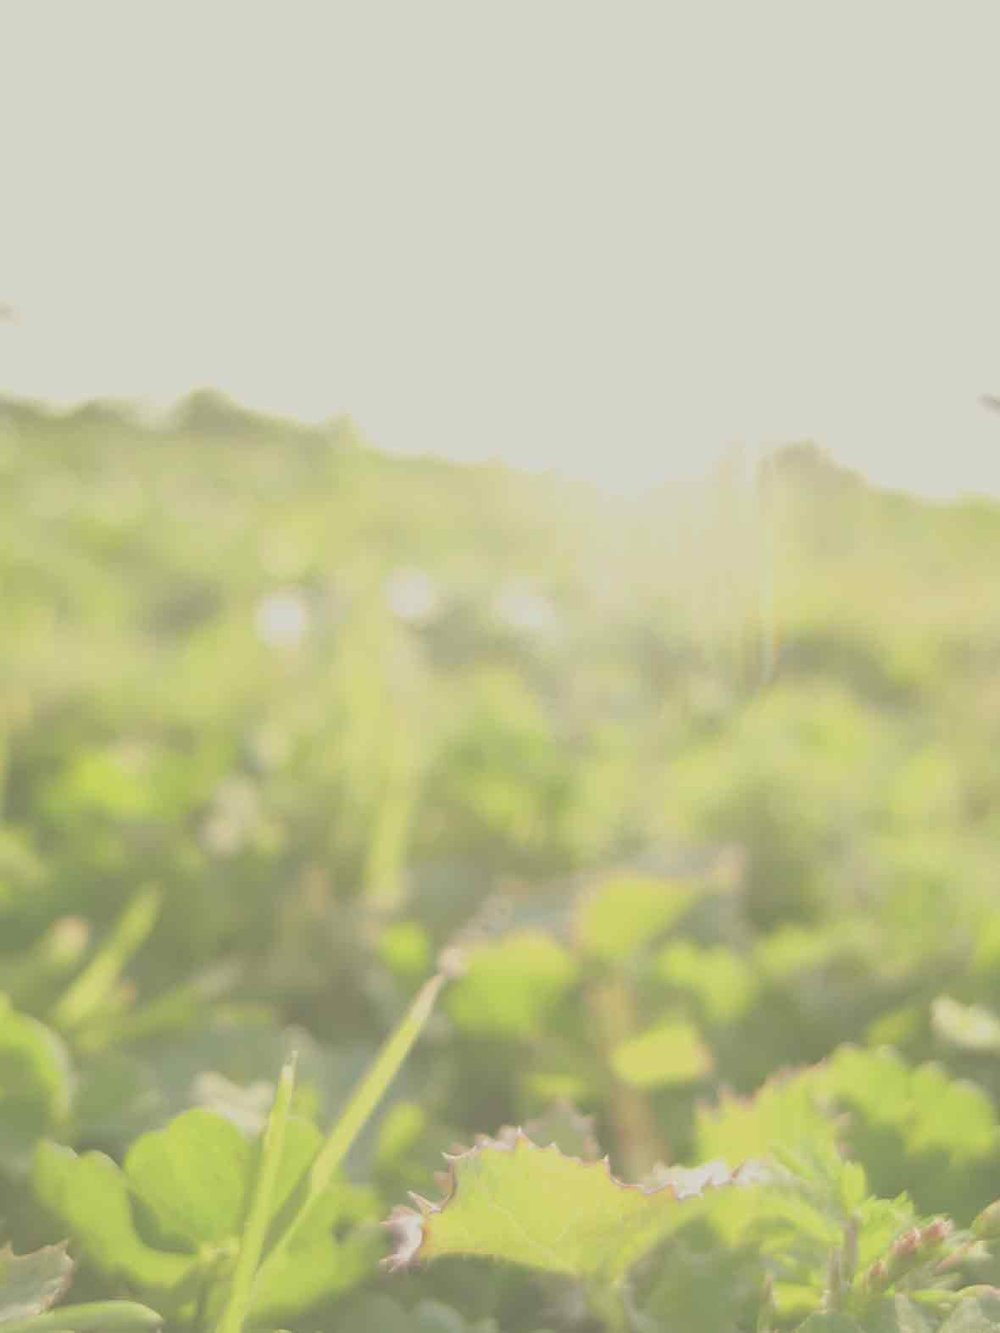 With humble thanks ... - Kim McLeanScott WilsonAdam CountrymanEric RumbleSilva HelmerGordy & Sandy BraunMarie GrayJason Christie & Andrea RyerDave WasylowBrendan FraserJeff StoreyClinton St. JohnDan CherwoniakKozak FamilyJordan TettensorSandeep AggarwalAnonymousJeff MacleodHelen HadalaShannon ZaychukRose Ashworth